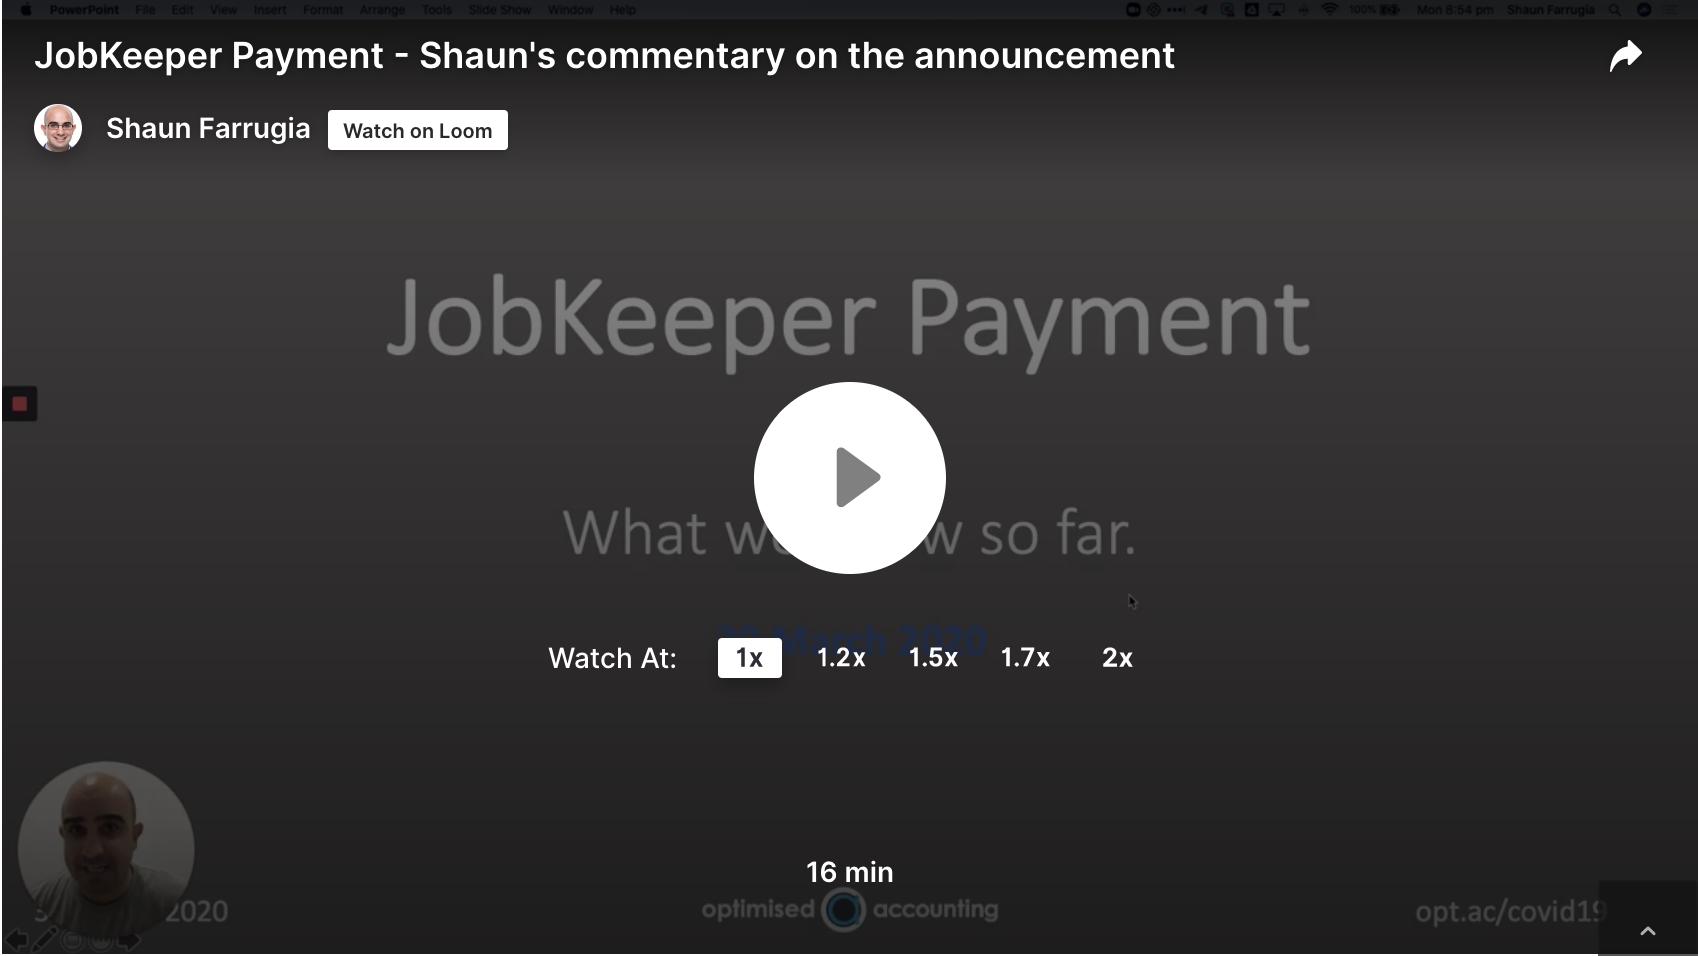 JobKeeper